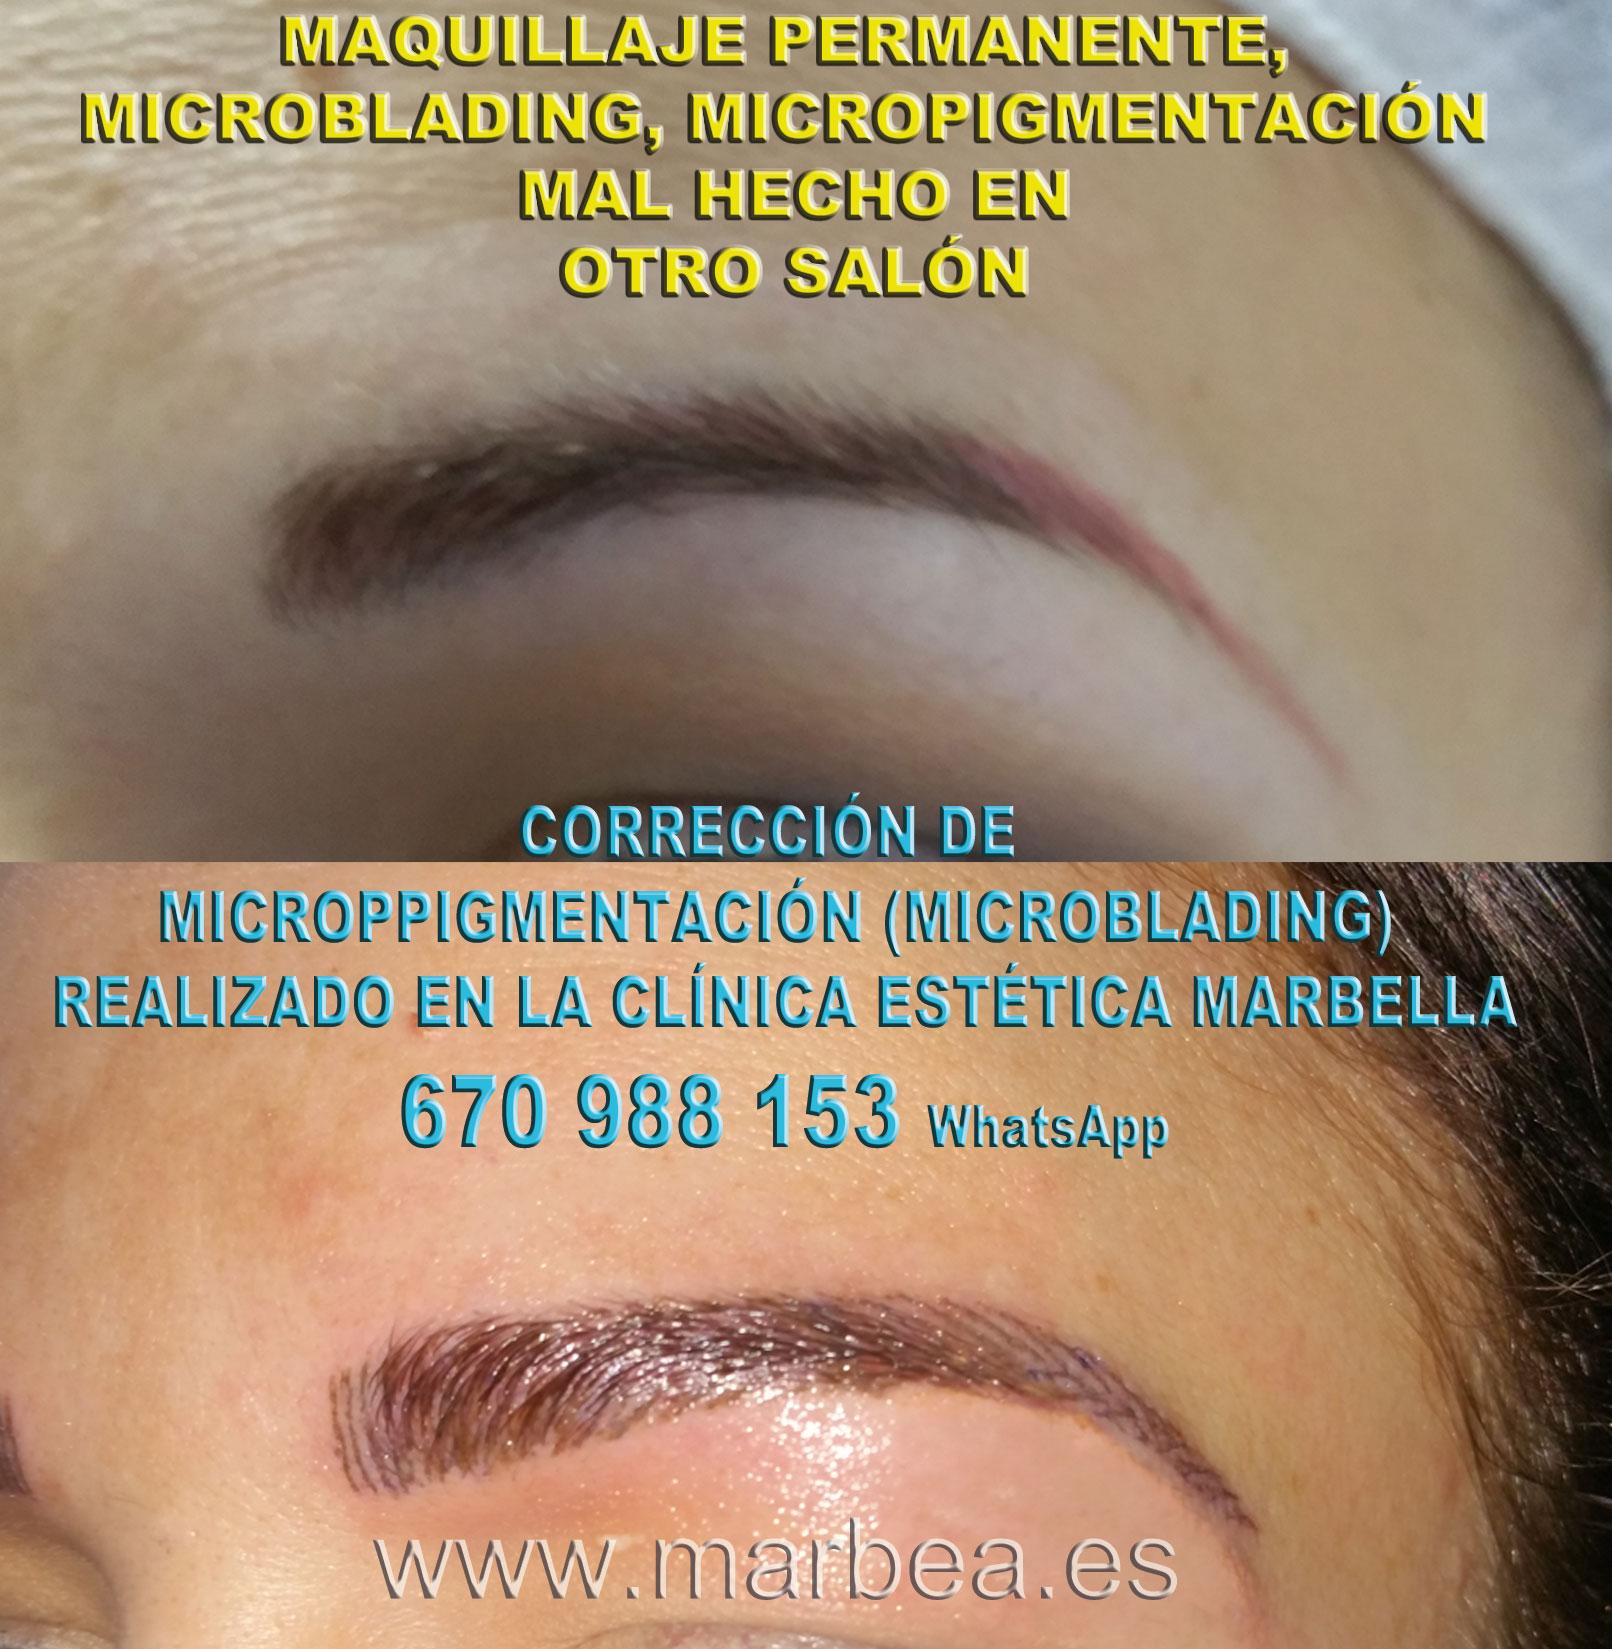 ELIMINAR MICROBLADING CEJAS clínica estética tatuaje entrega micropigmentacion correctiva de cejas,reparamos microppigmentacion mal hechos